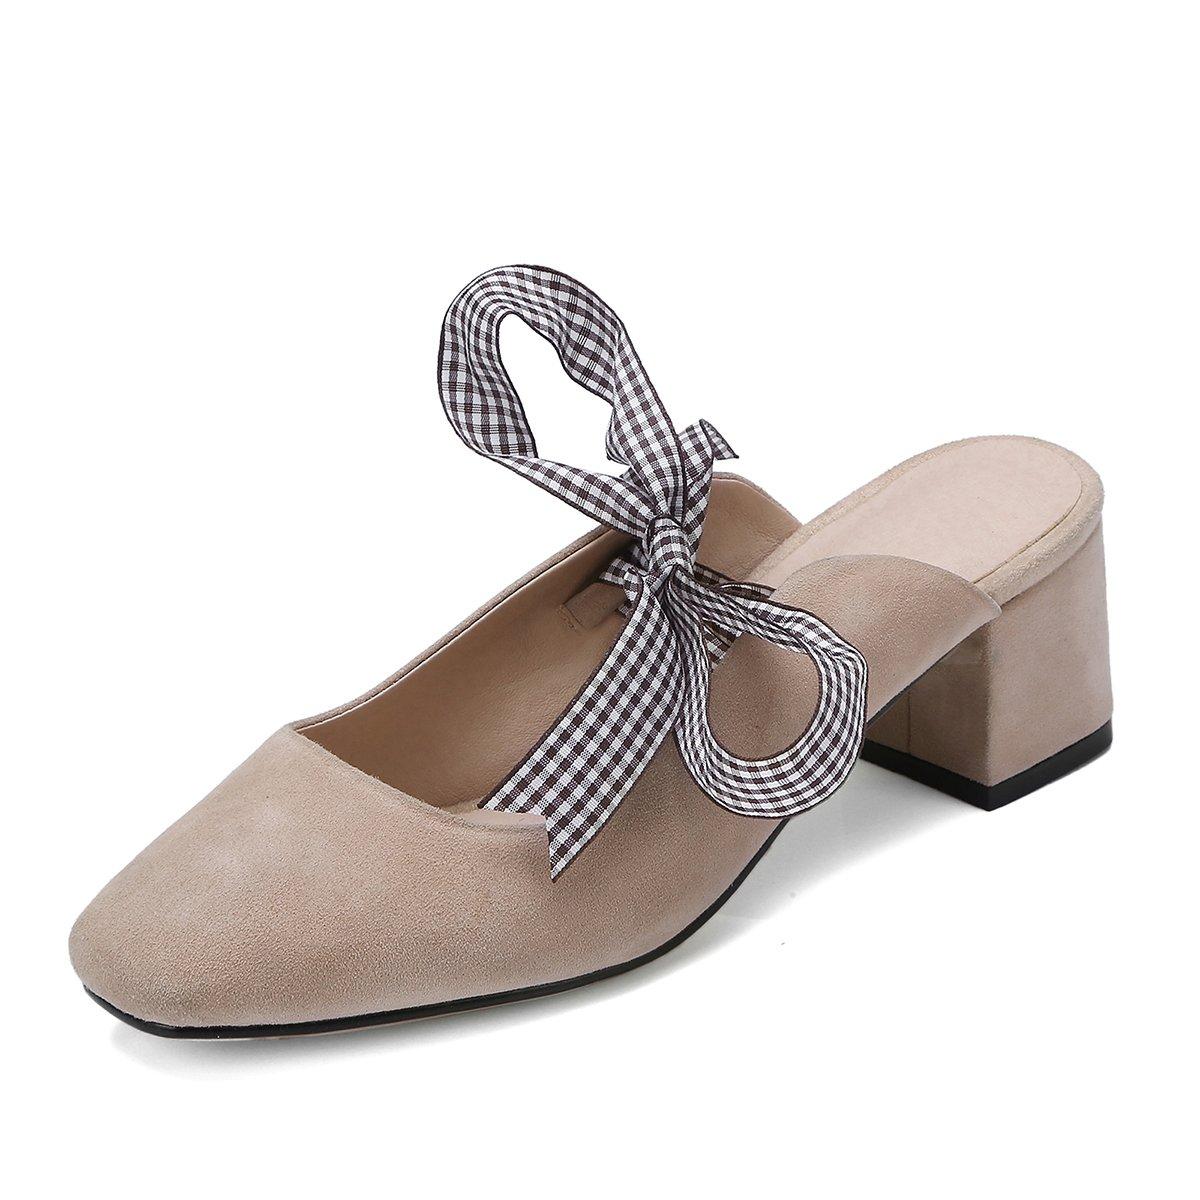 Qingchunhuangtang@ Frühling und Sommer Sandalen Strap Sandalen Sandalen Sandalen Hausschuhe faul High-Heeled Sandalen 26f656